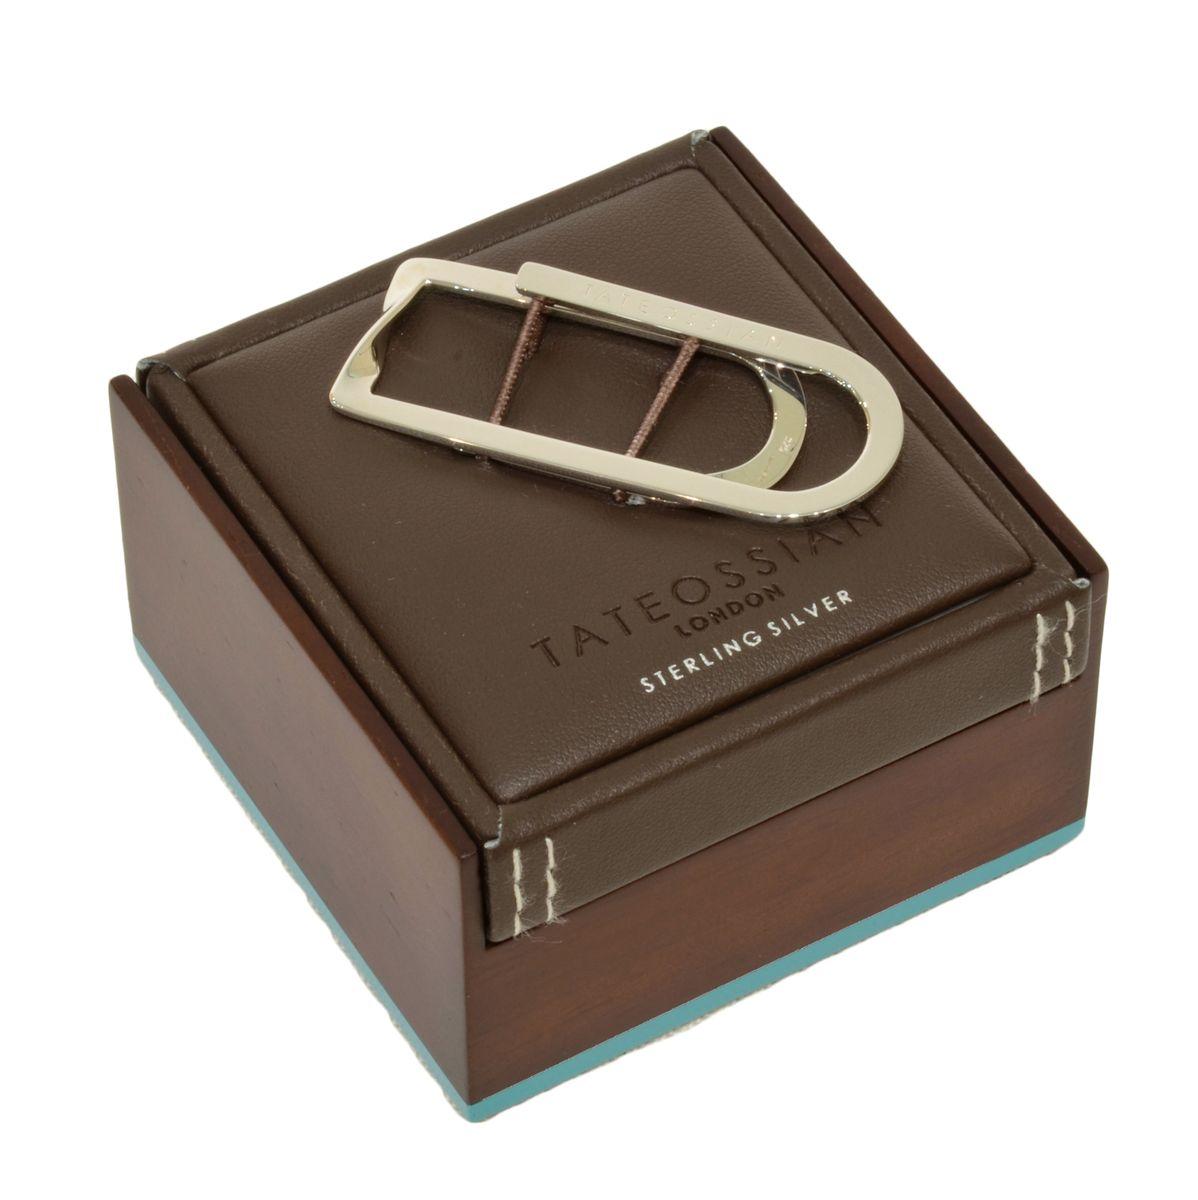 TATEOSSIAN(タテオシアン)スターリングシルバーツイストマネークリップ MC0036 19462209094